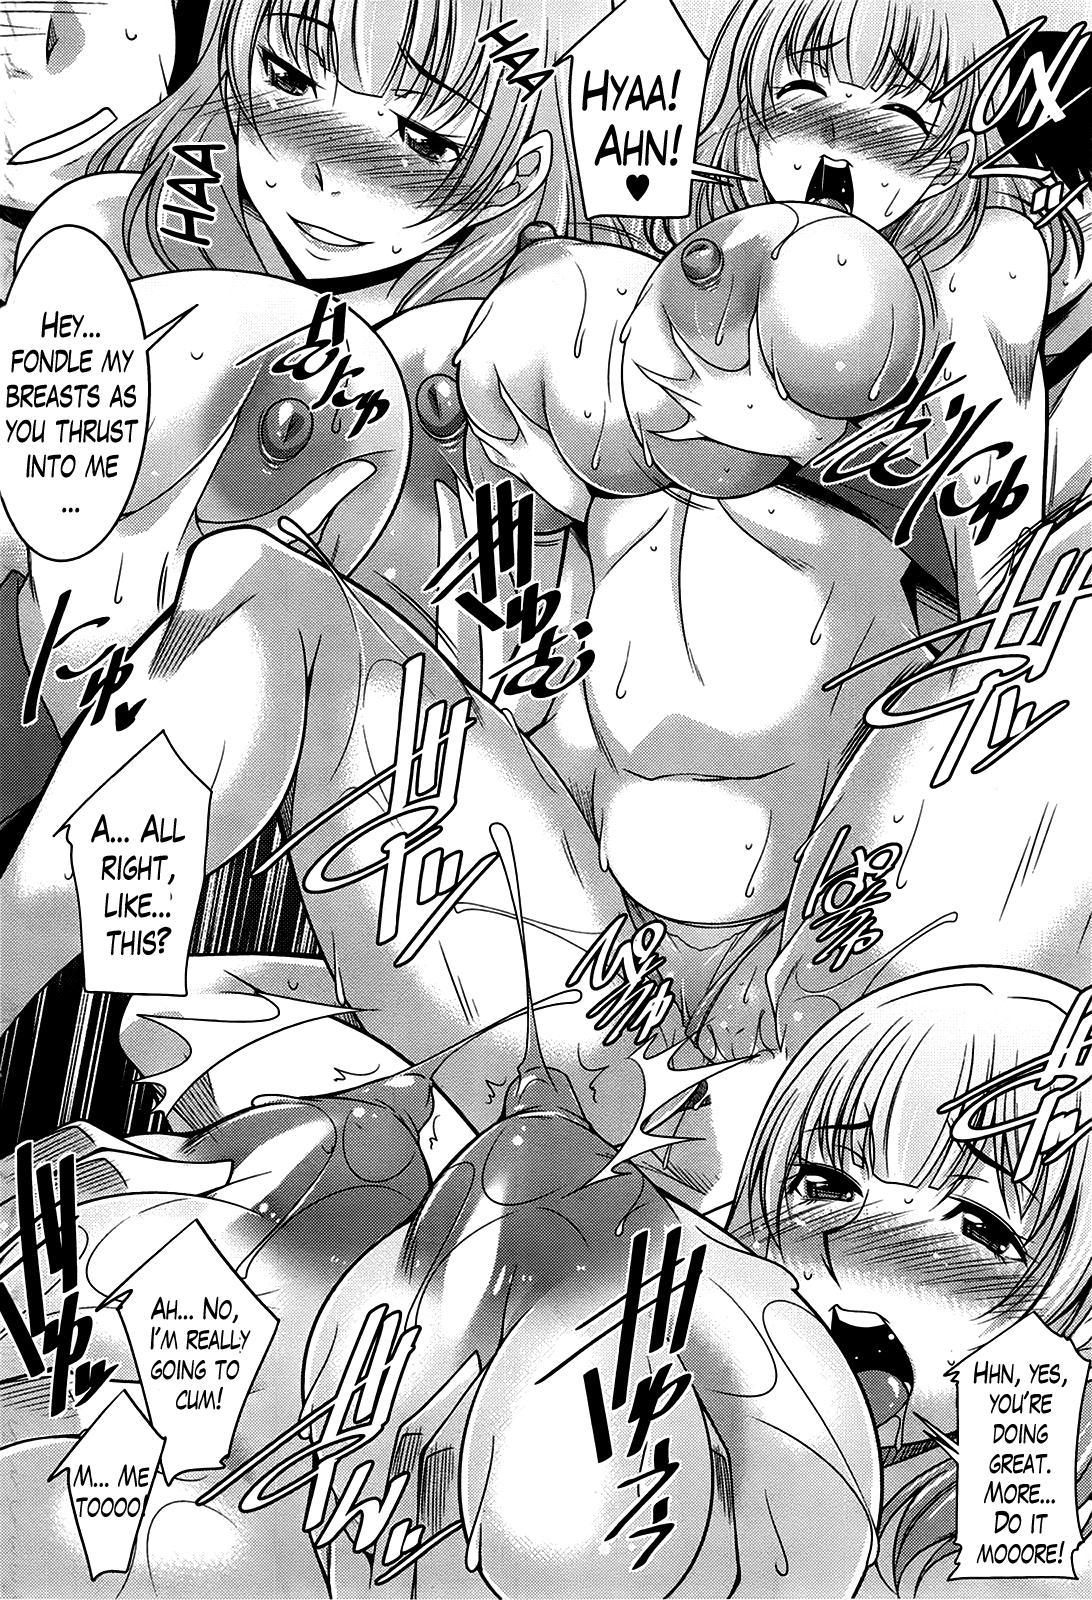 [Zen9] Taikutsu na Gogo no Sugoshikata Ch. 1-4   A Way to Spend a Boring Afternoon Ch. 1-4 (Action Pizazz DX 2013-12) [English](hentai2read.com)[Lazarus H] 35